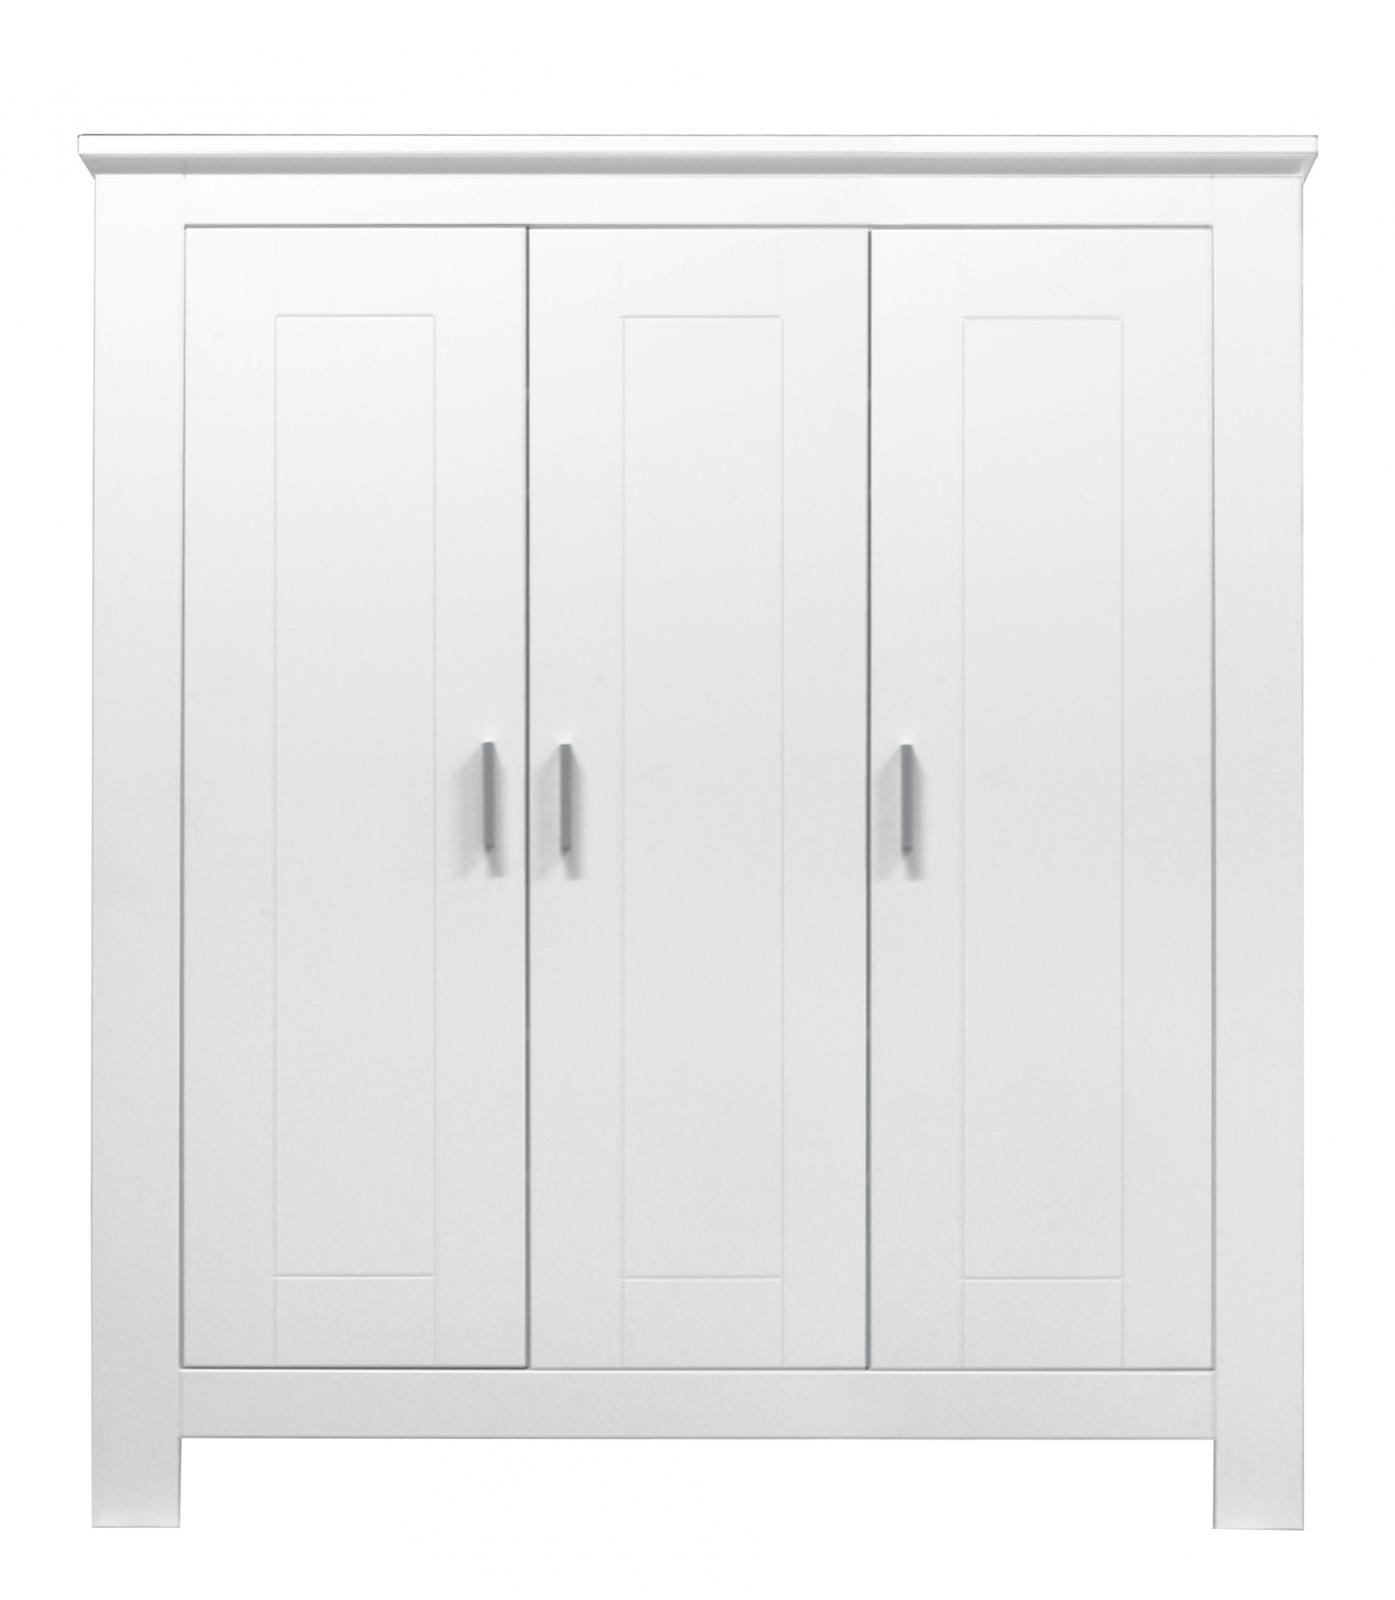 Bopita Cobi 3-Doors Wardrobe